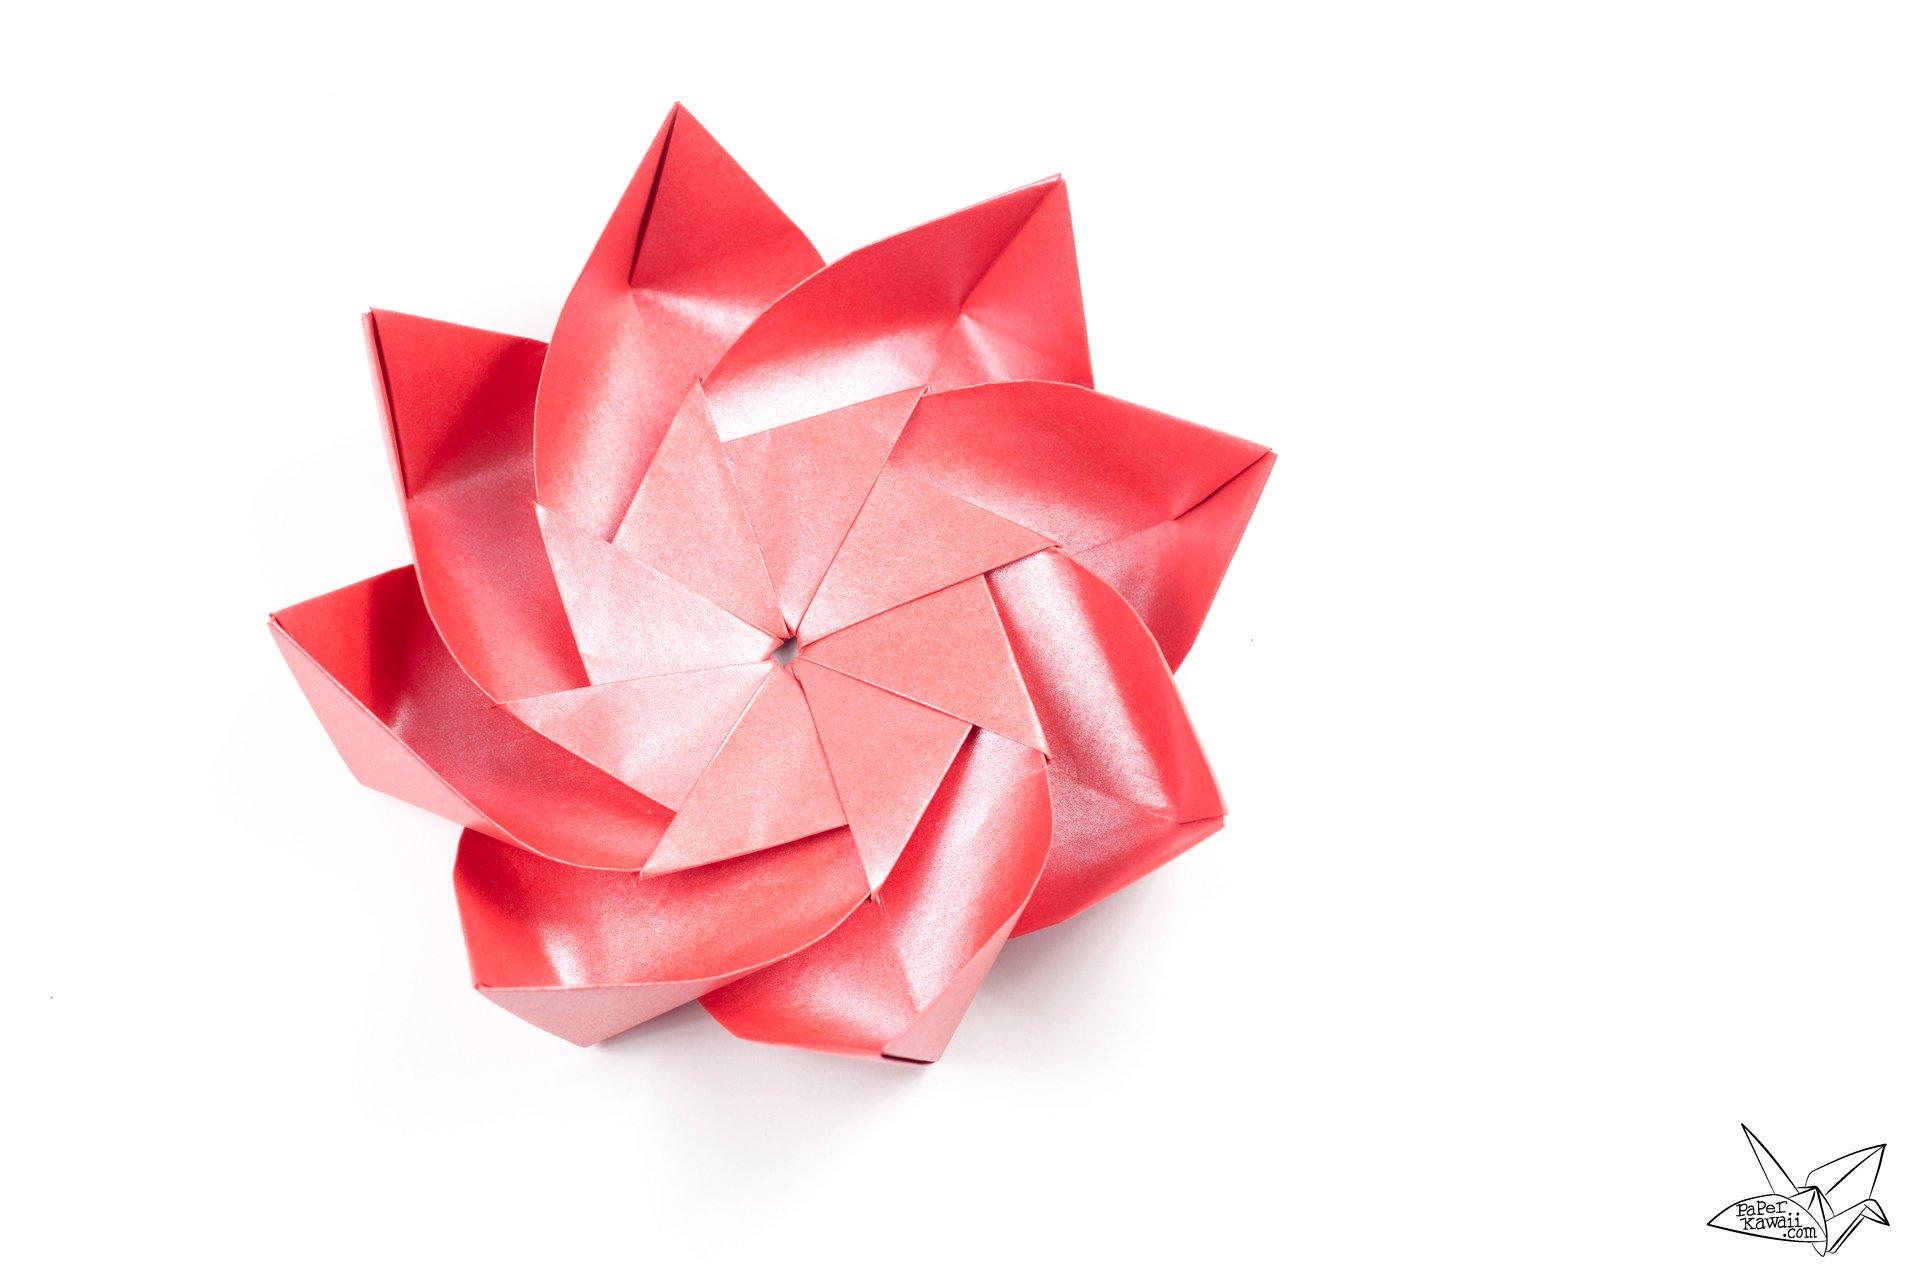 Modular Origami Lotus Flower With 8 Petals Tutorial